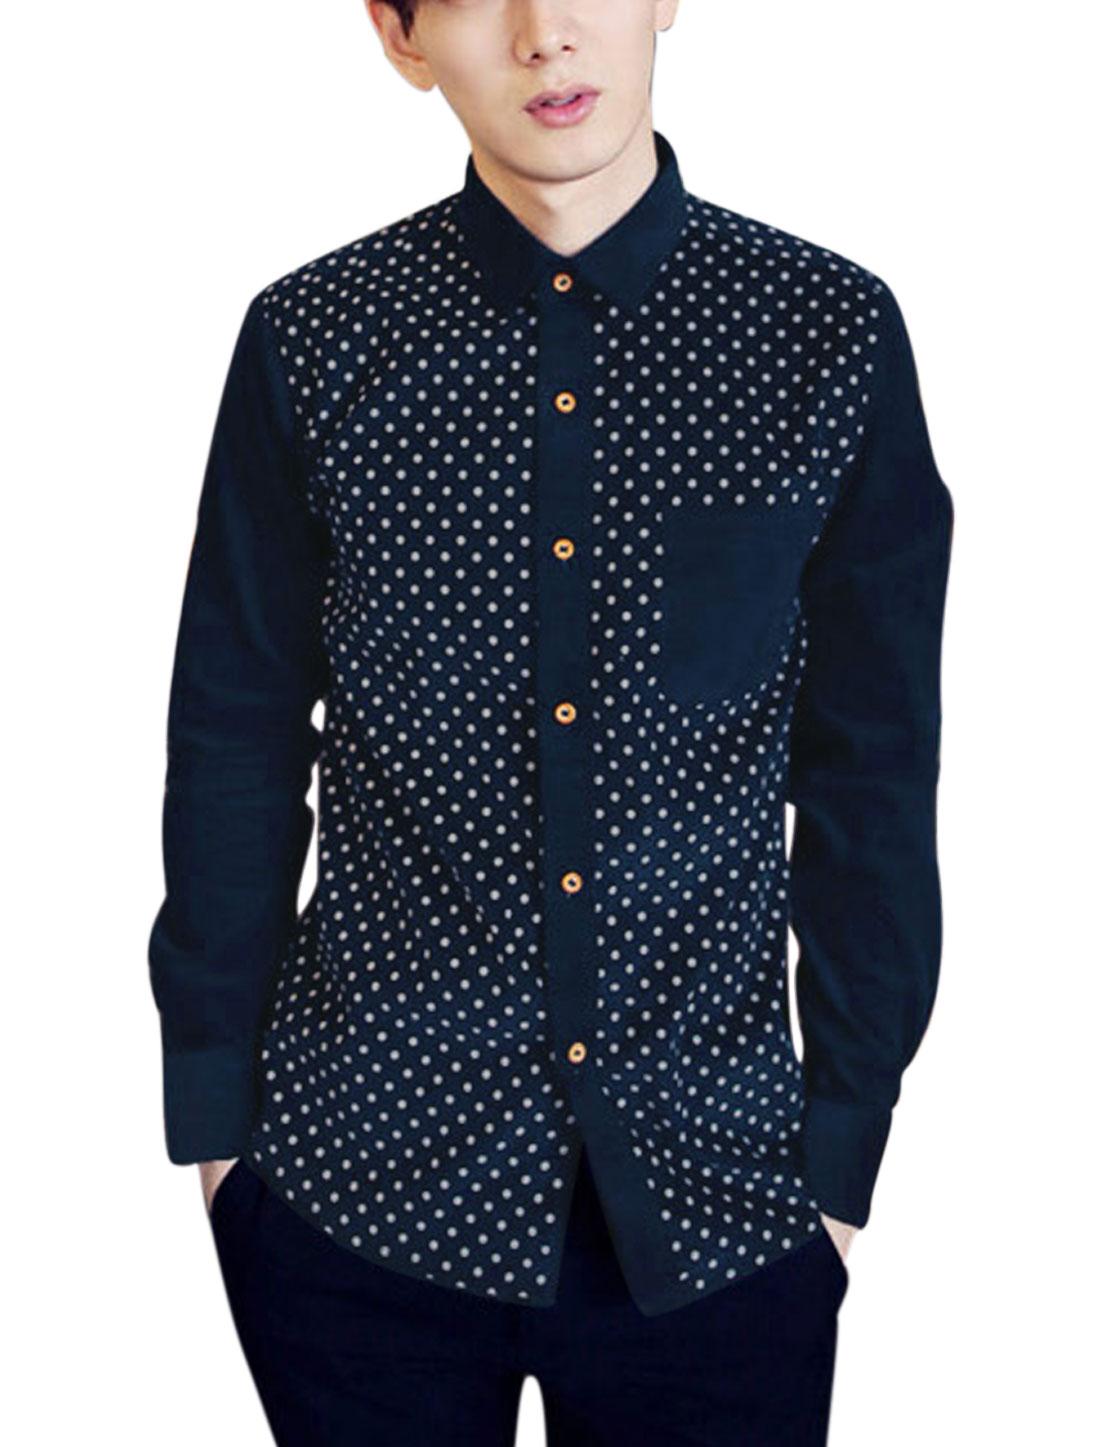 Men Dots Pattern Single Breasted Chest Pocket Round Hem Shirt Navy Blue M